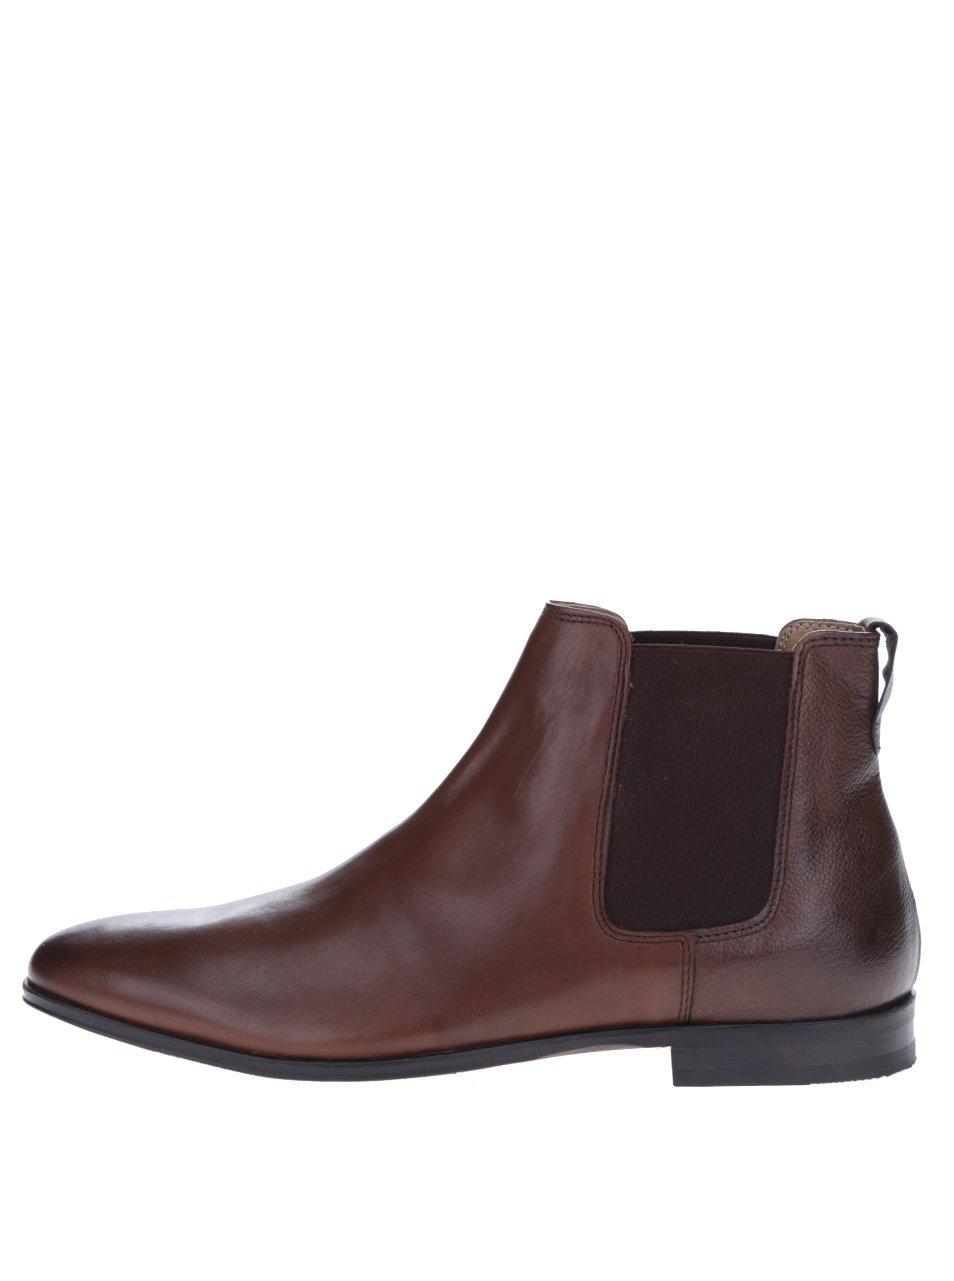 Tmavě hnědé kožené chelsea boty Burton Menswear London